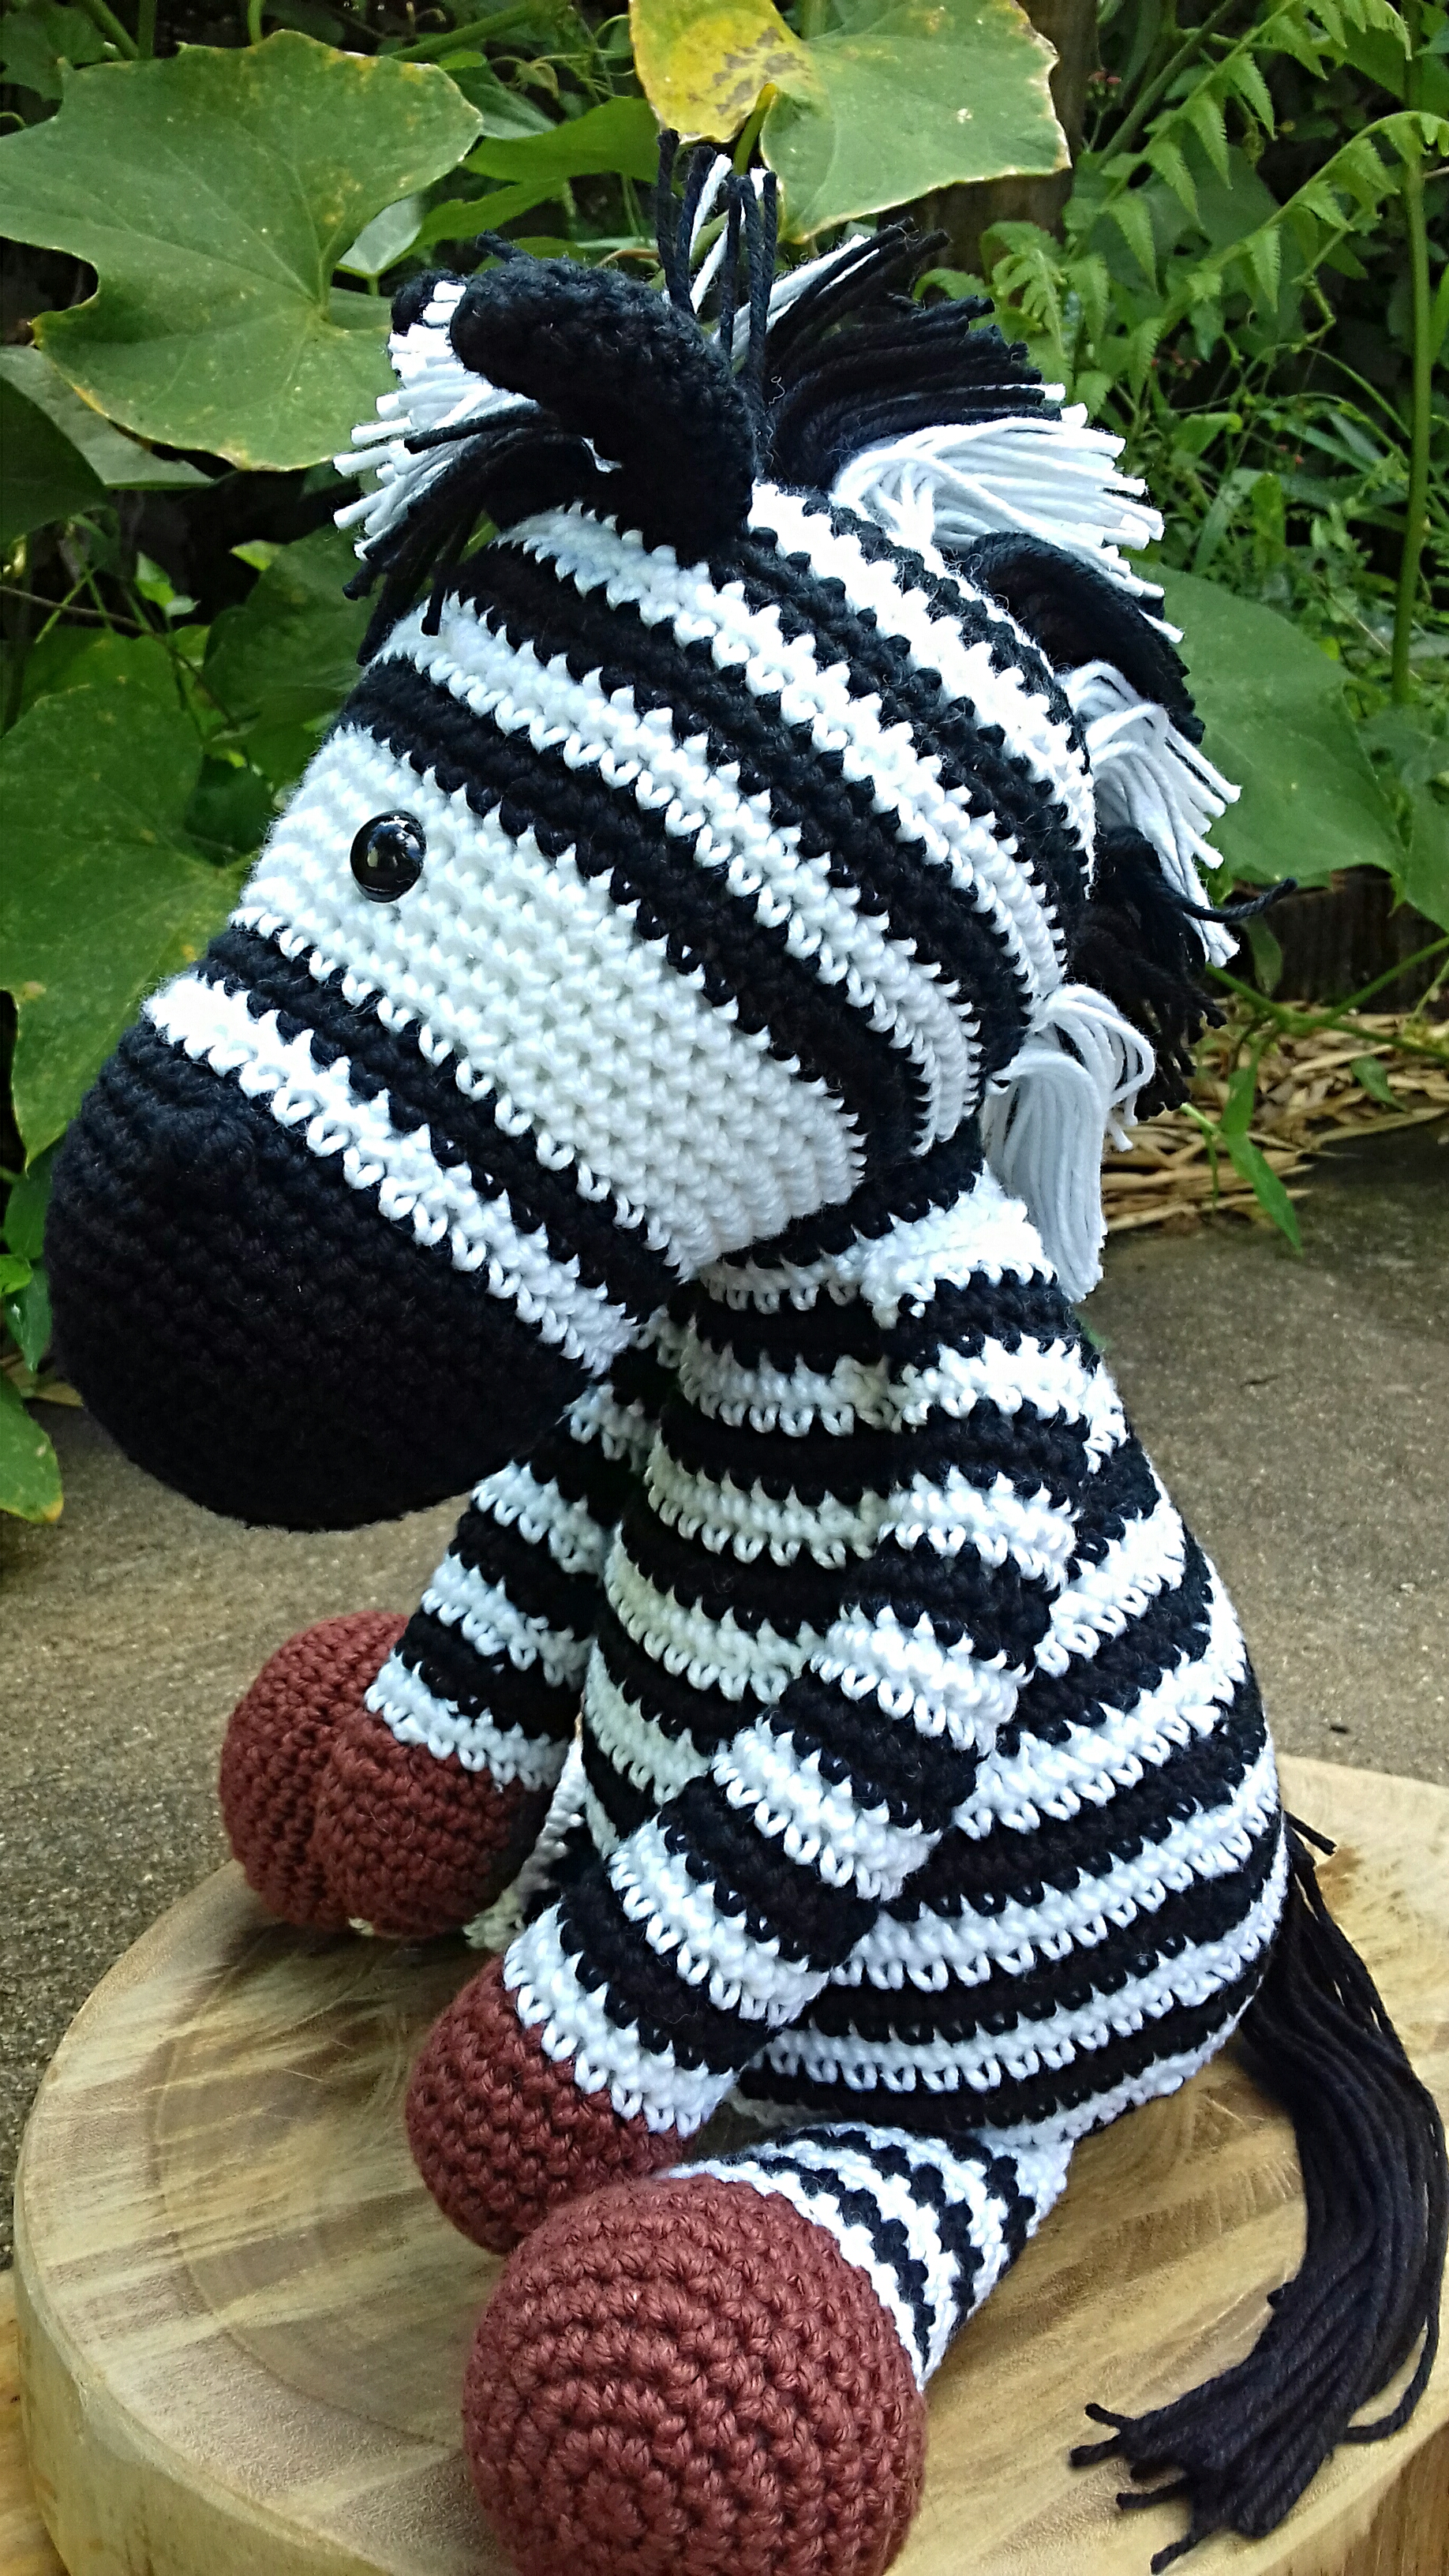 Amigurumi de Crochê Zebra Zulú 23 cm | Arquitetas Express | 3264x1836